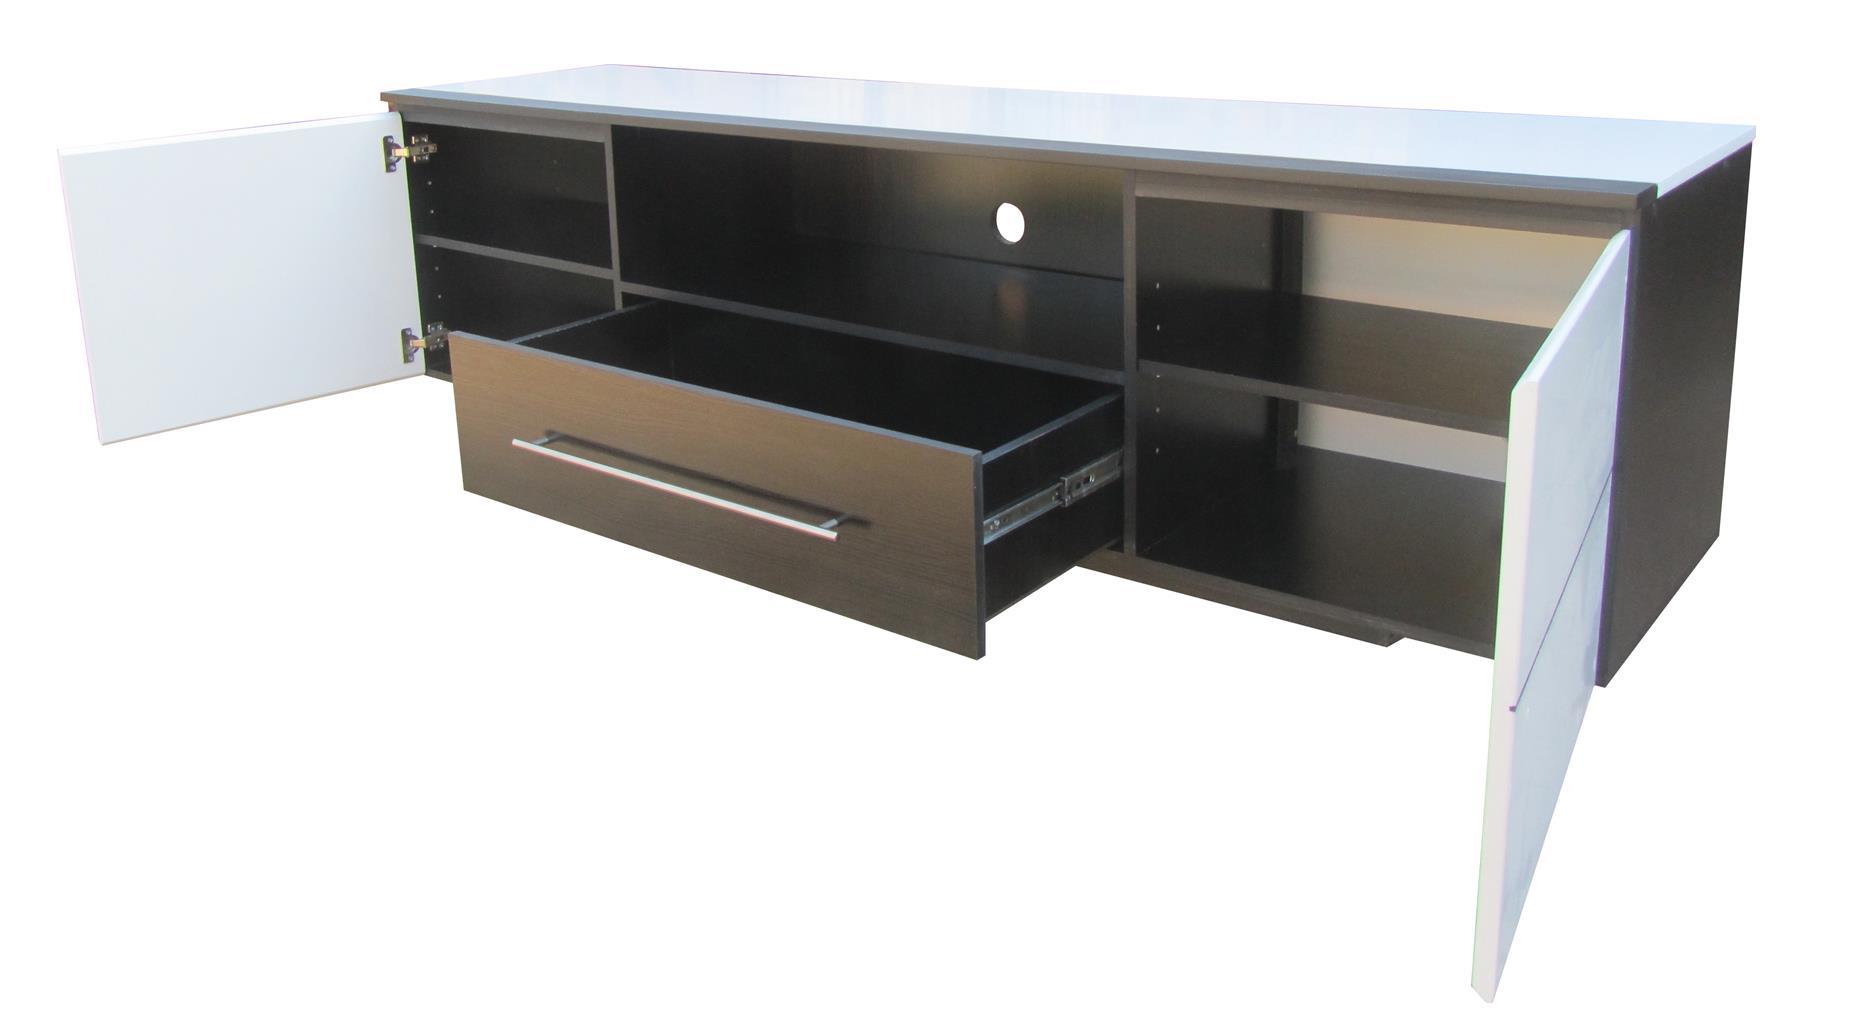 New modern Tv stand black & white high gloss finish 2 100 W x 600 D x 500 H. R 3 500